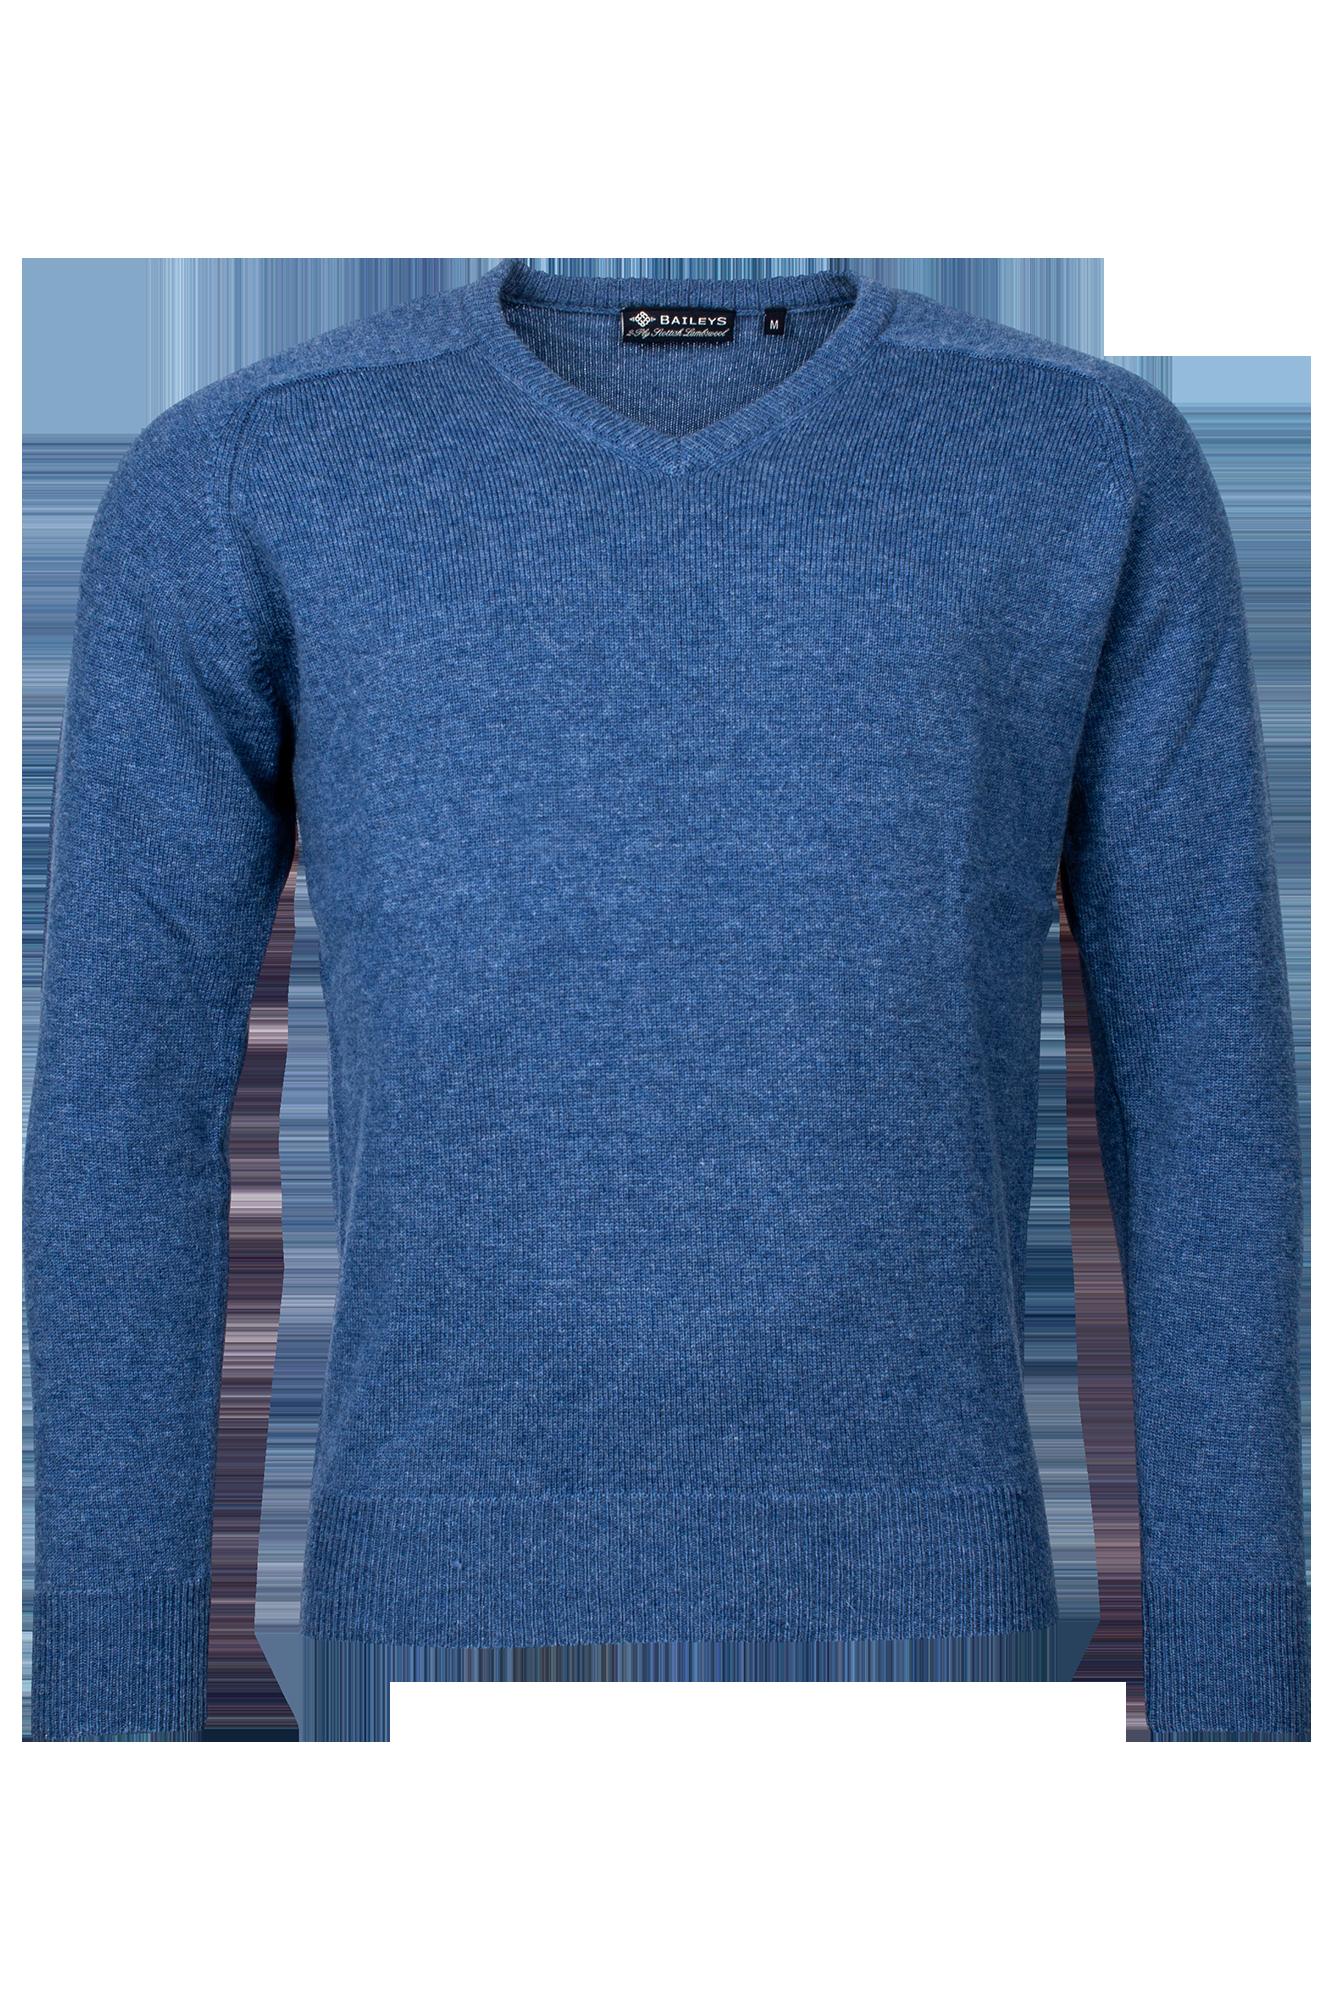 Baileys lamswollen pullover, v-hals, kobalt blauw gemêleerd